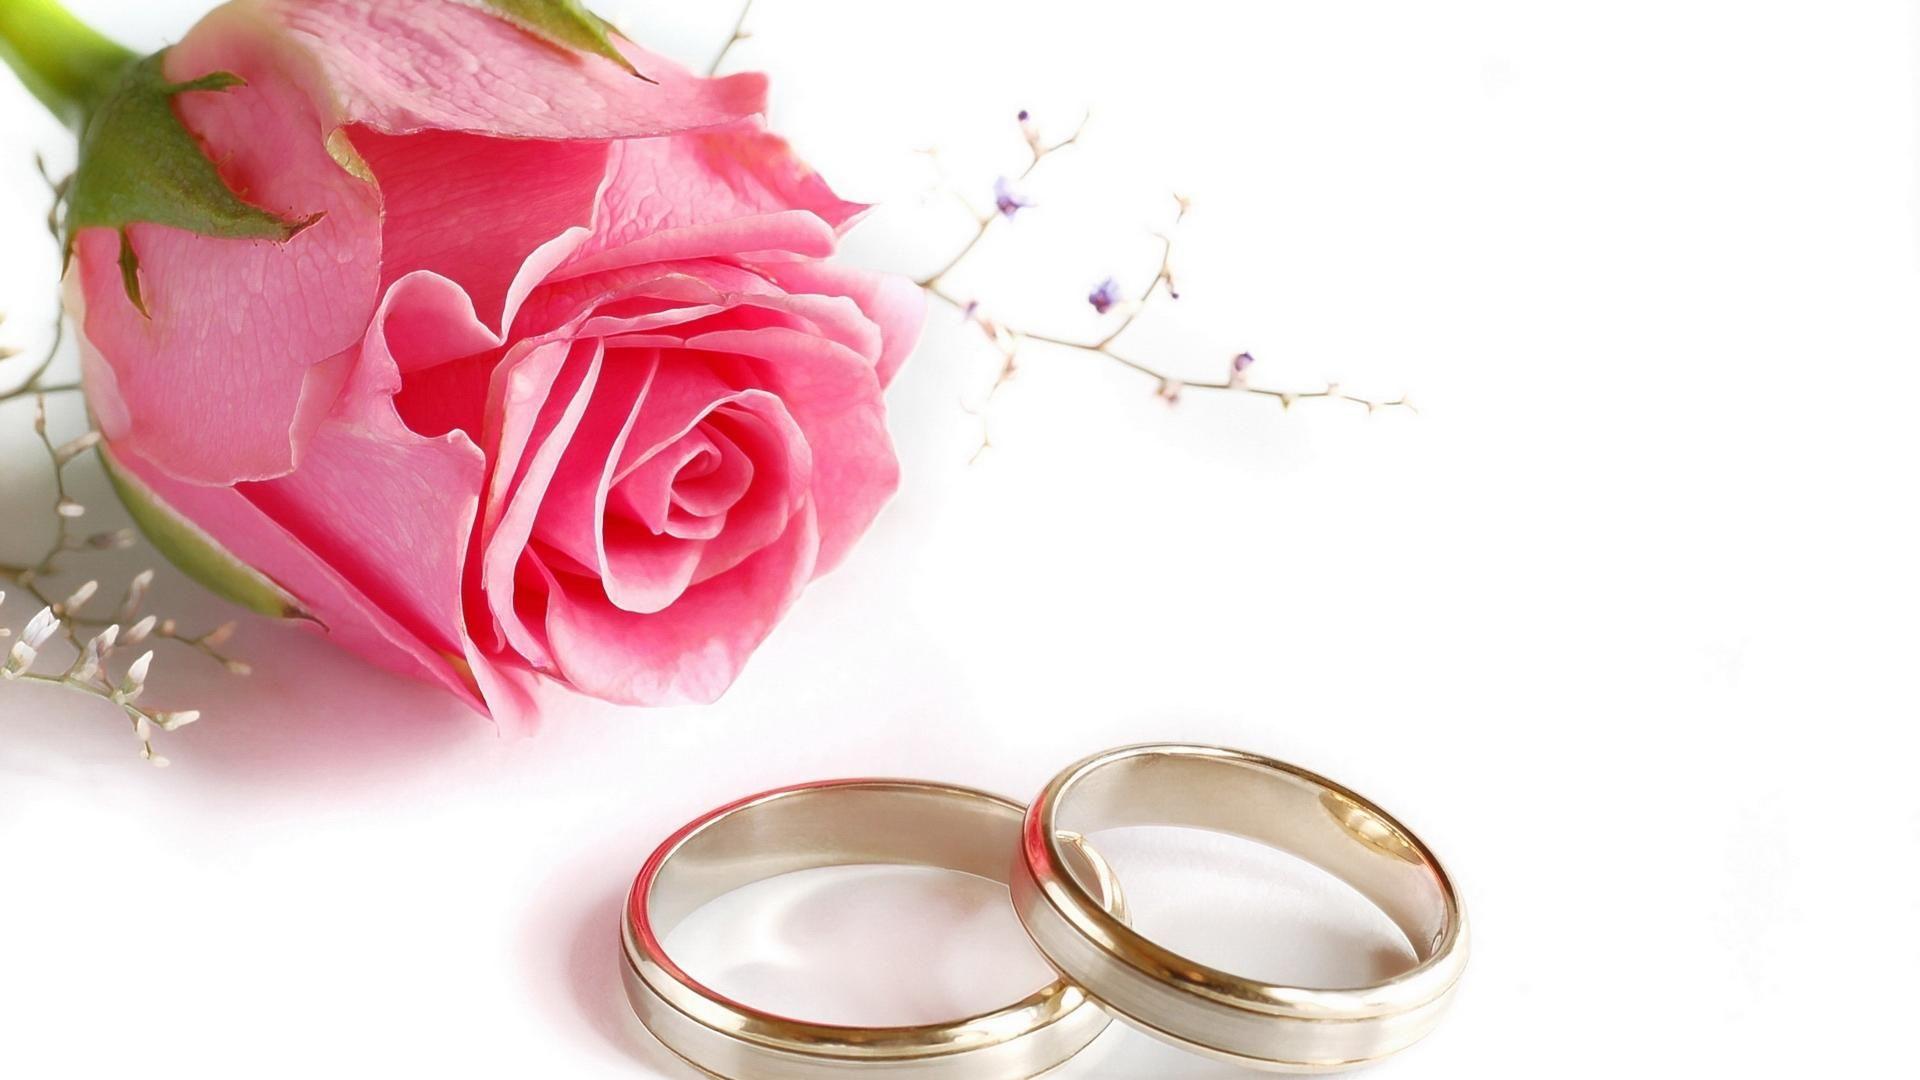 Wedding Rings Rose Flower HD Wallpaper Хочу здесь